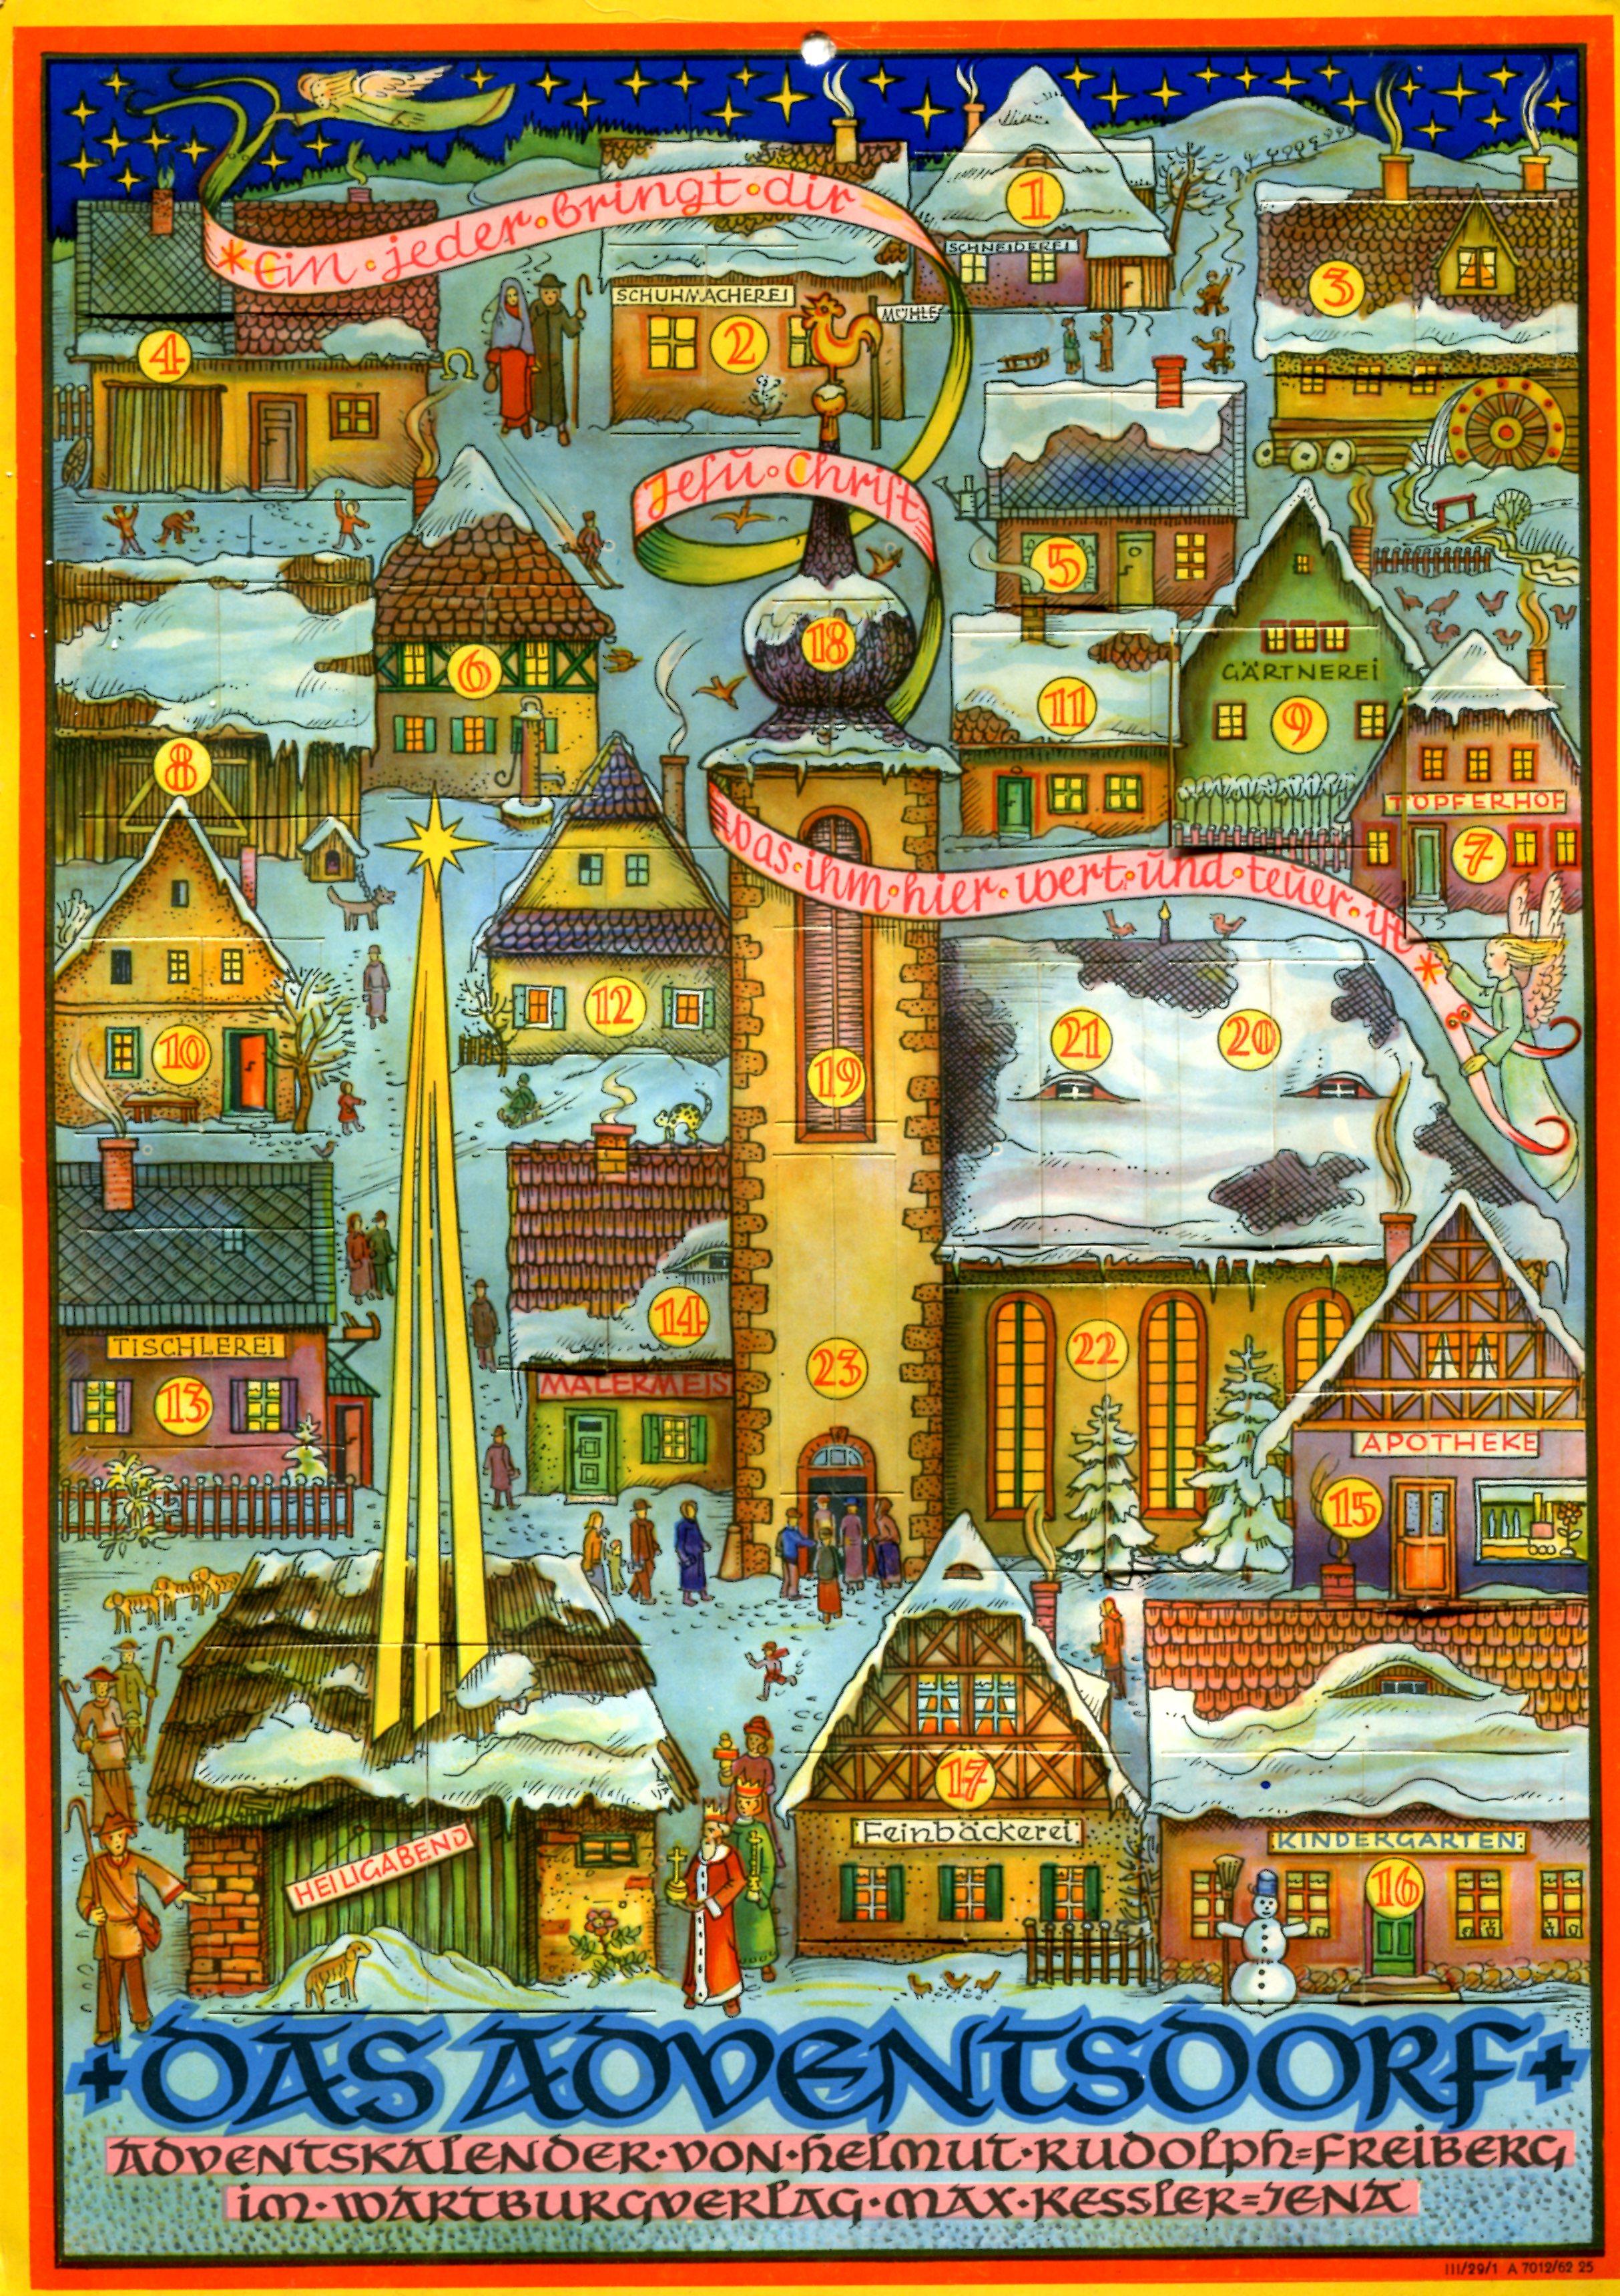 Adventskalender Helmut Rudolph